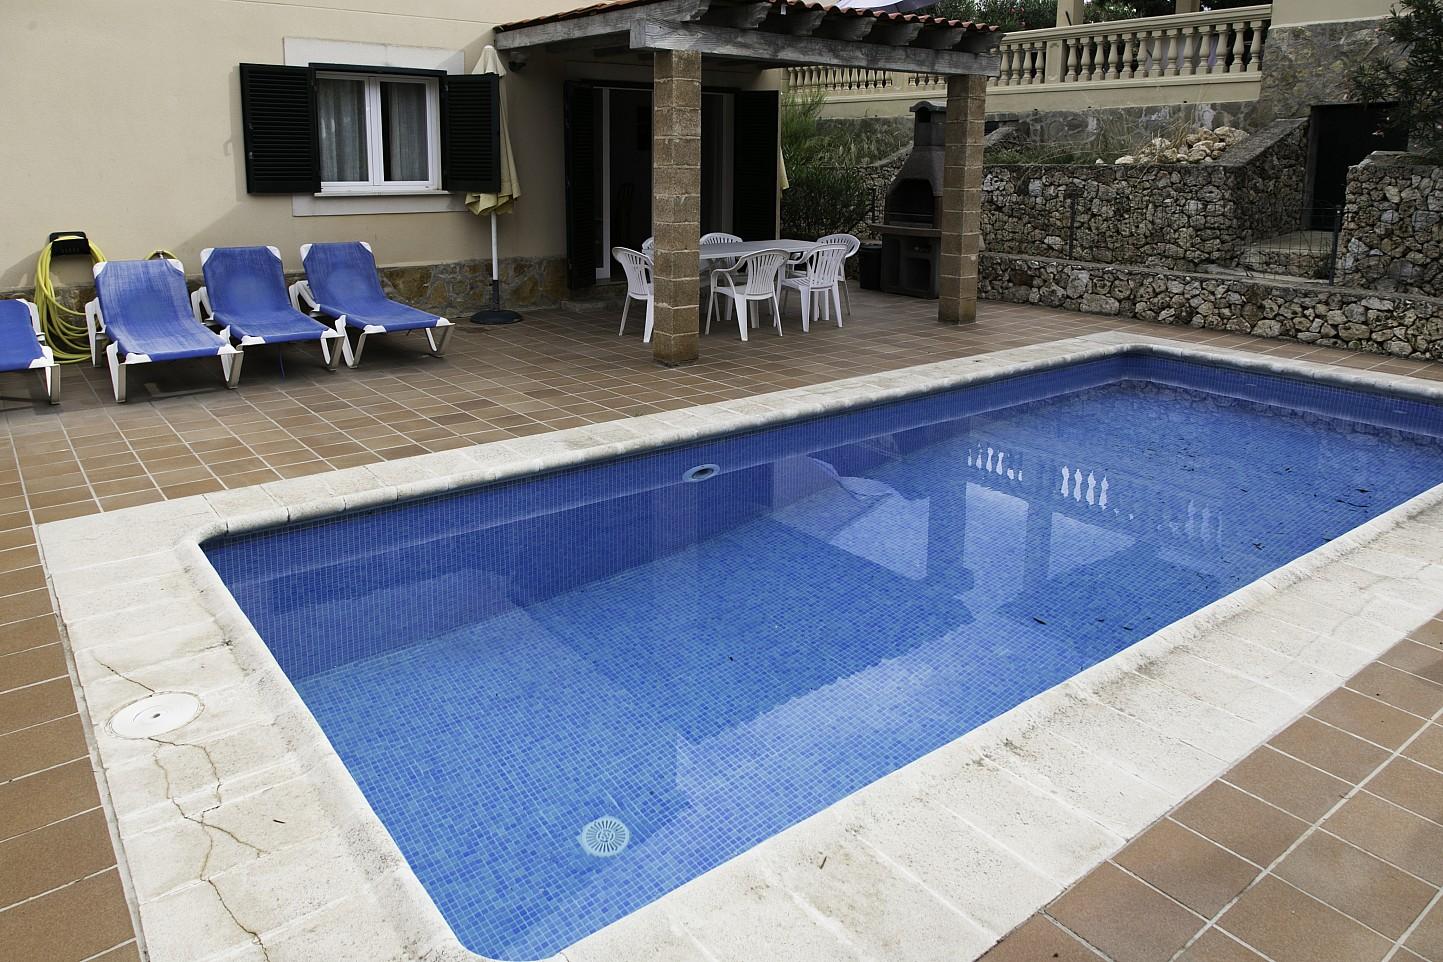 Piscina propia de bonita casa en venta en Urb. Villas de Cala Romántica en Mallorca